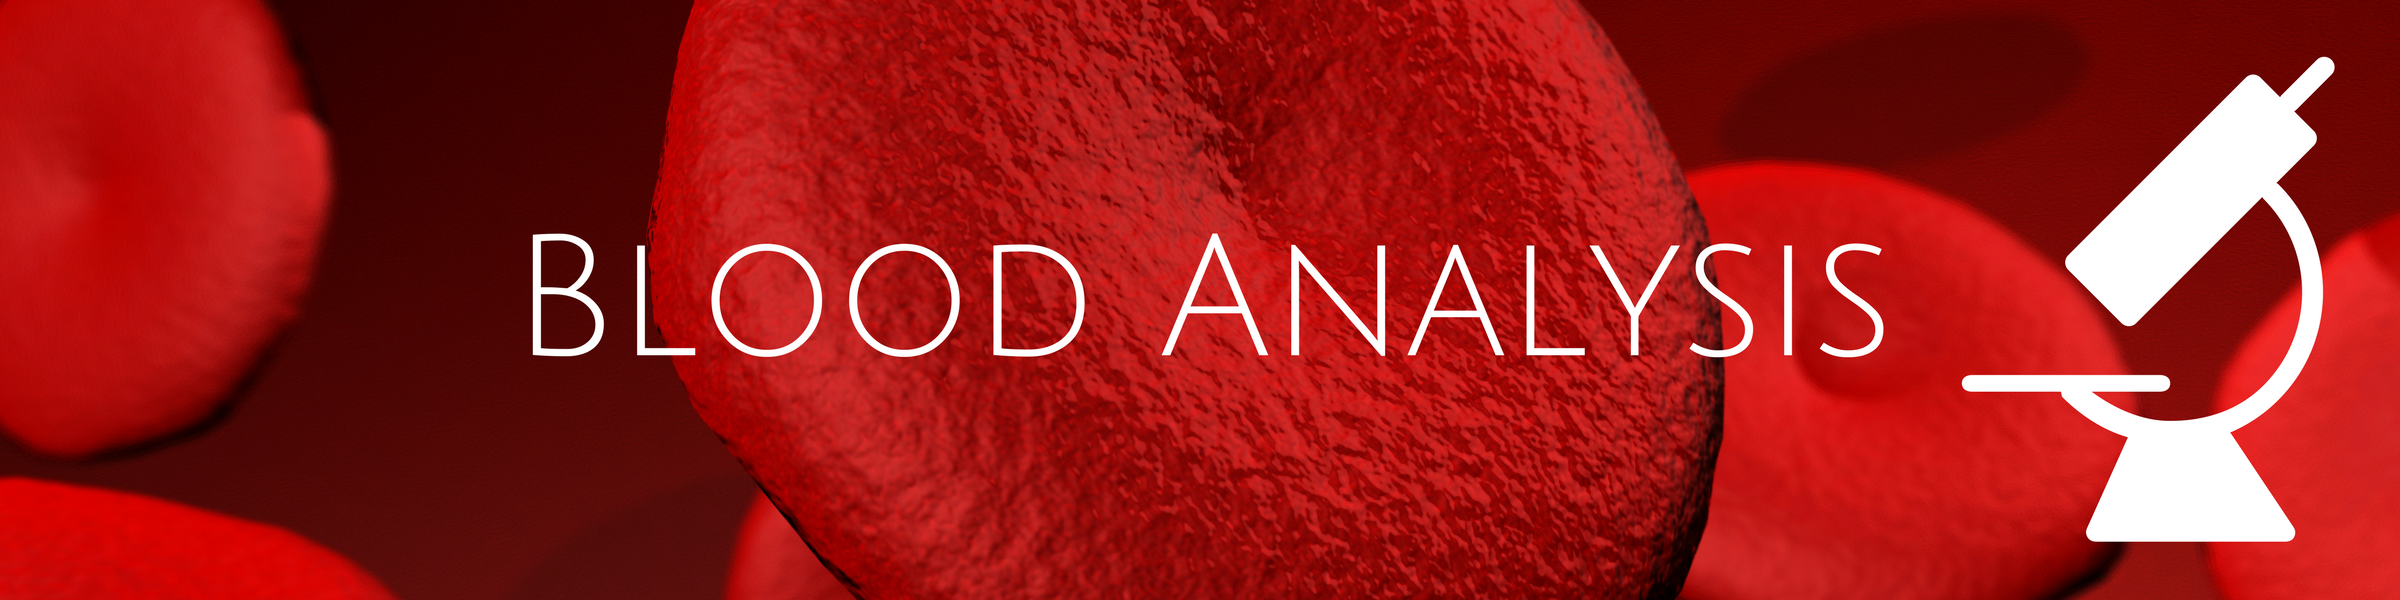 Blood Analysis: Dry blood analysis and Live Blood Analysis